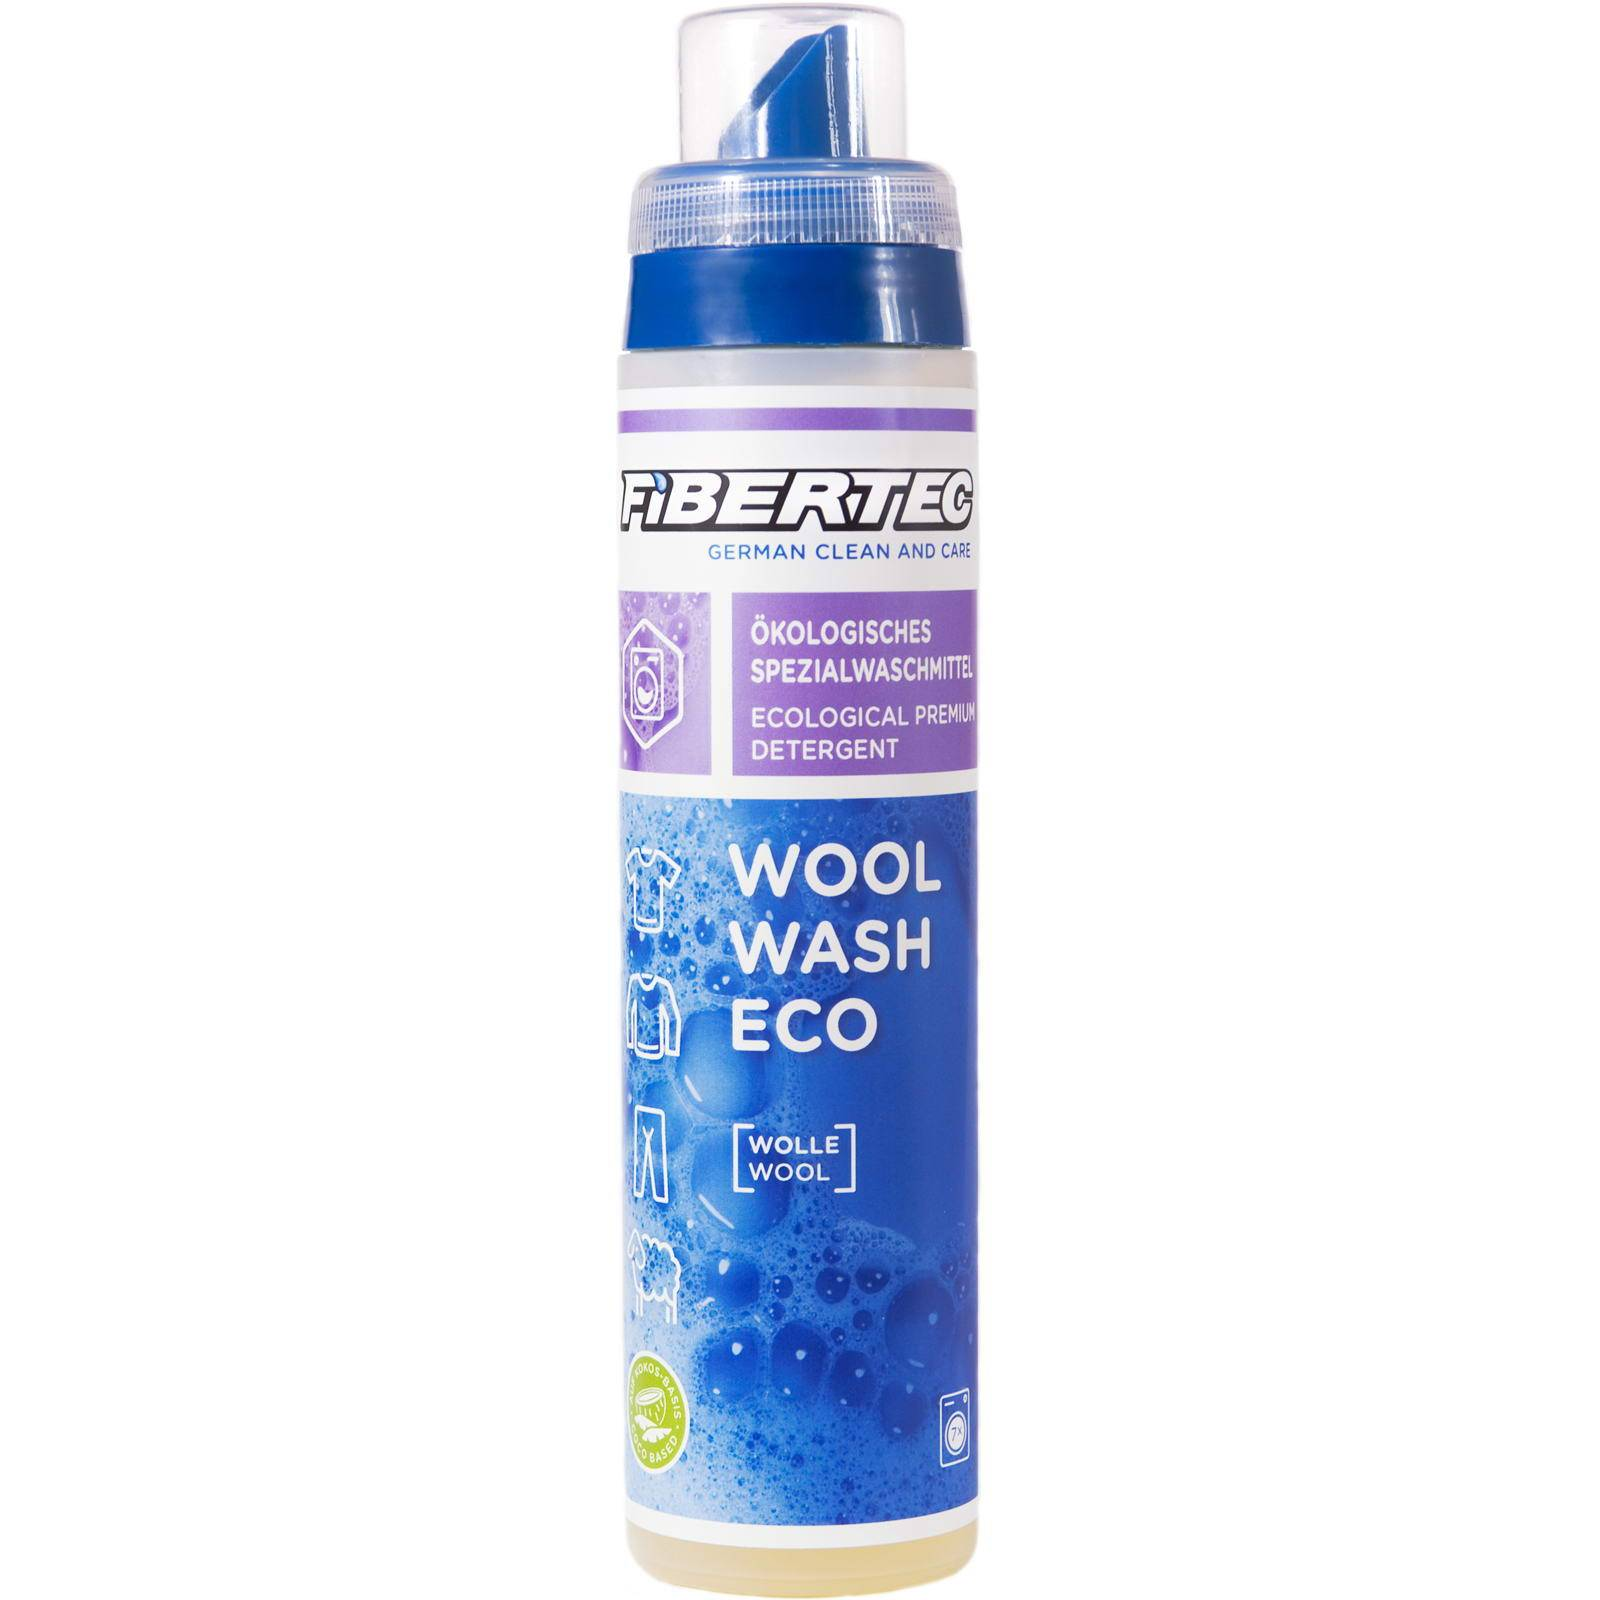 FIBERTEC Wool Wash Eco 250 ml - Spezial-Woll-Waschmittel - Bild 1